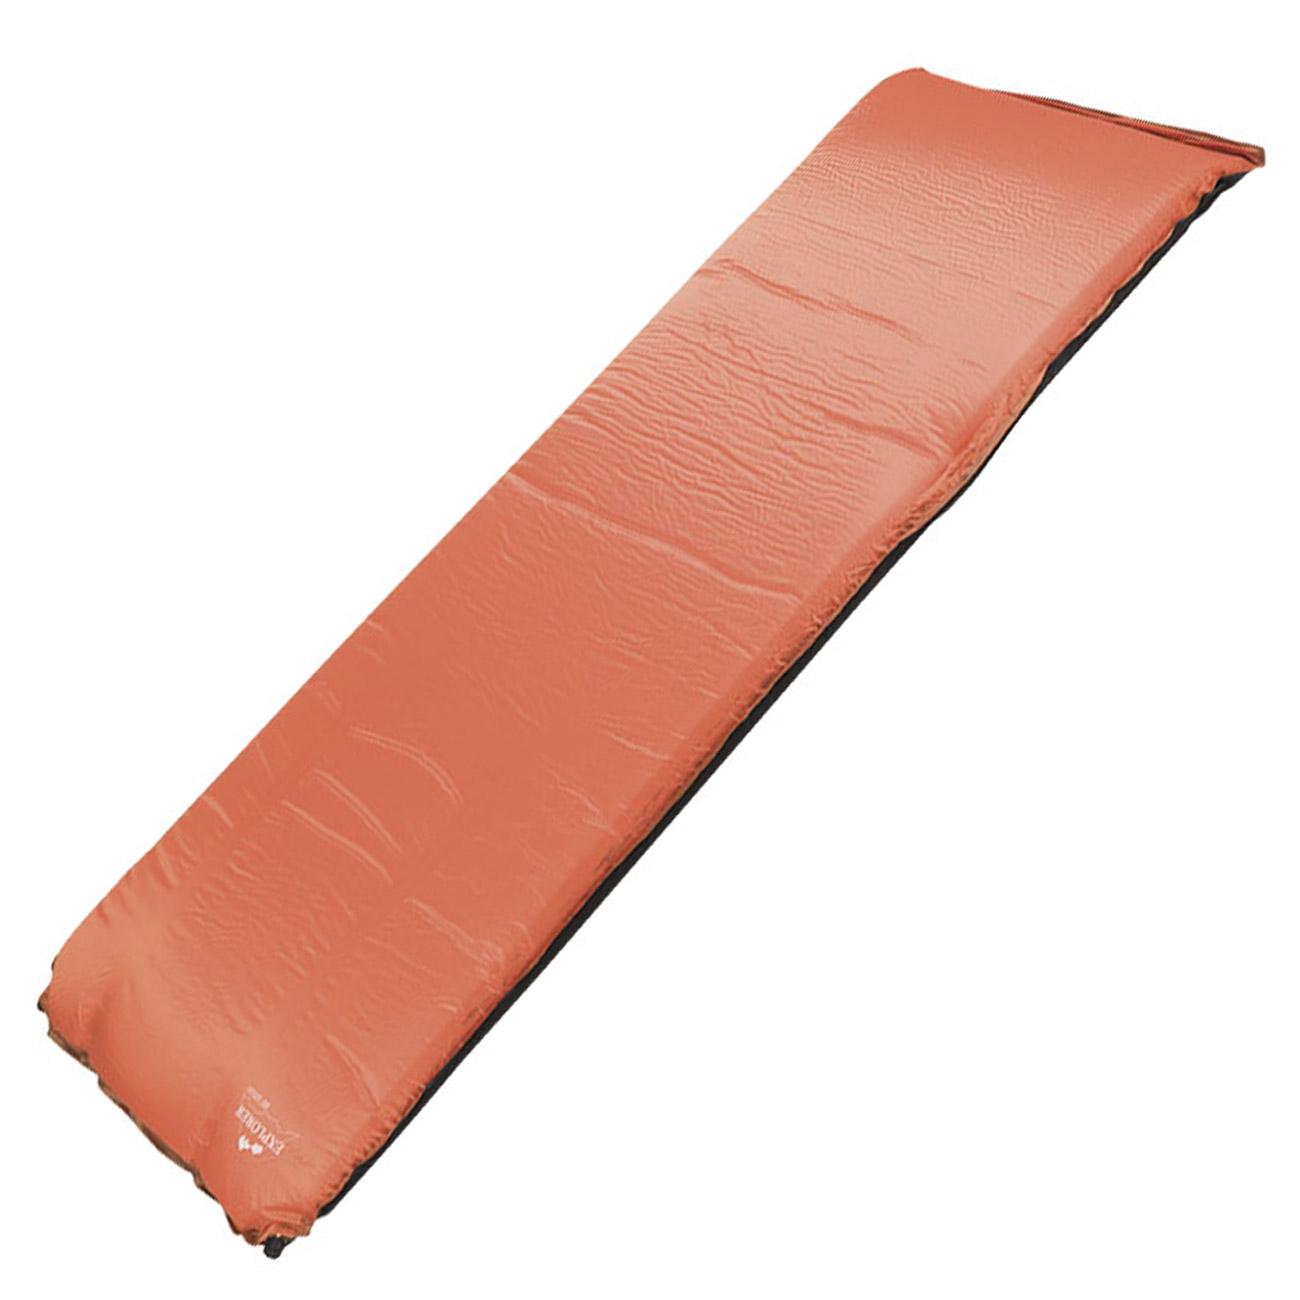 explorer isomatte selbstaufblasend orange g nstig kaufen. Black Bedroom Furniture Sets. Home Design Ideas